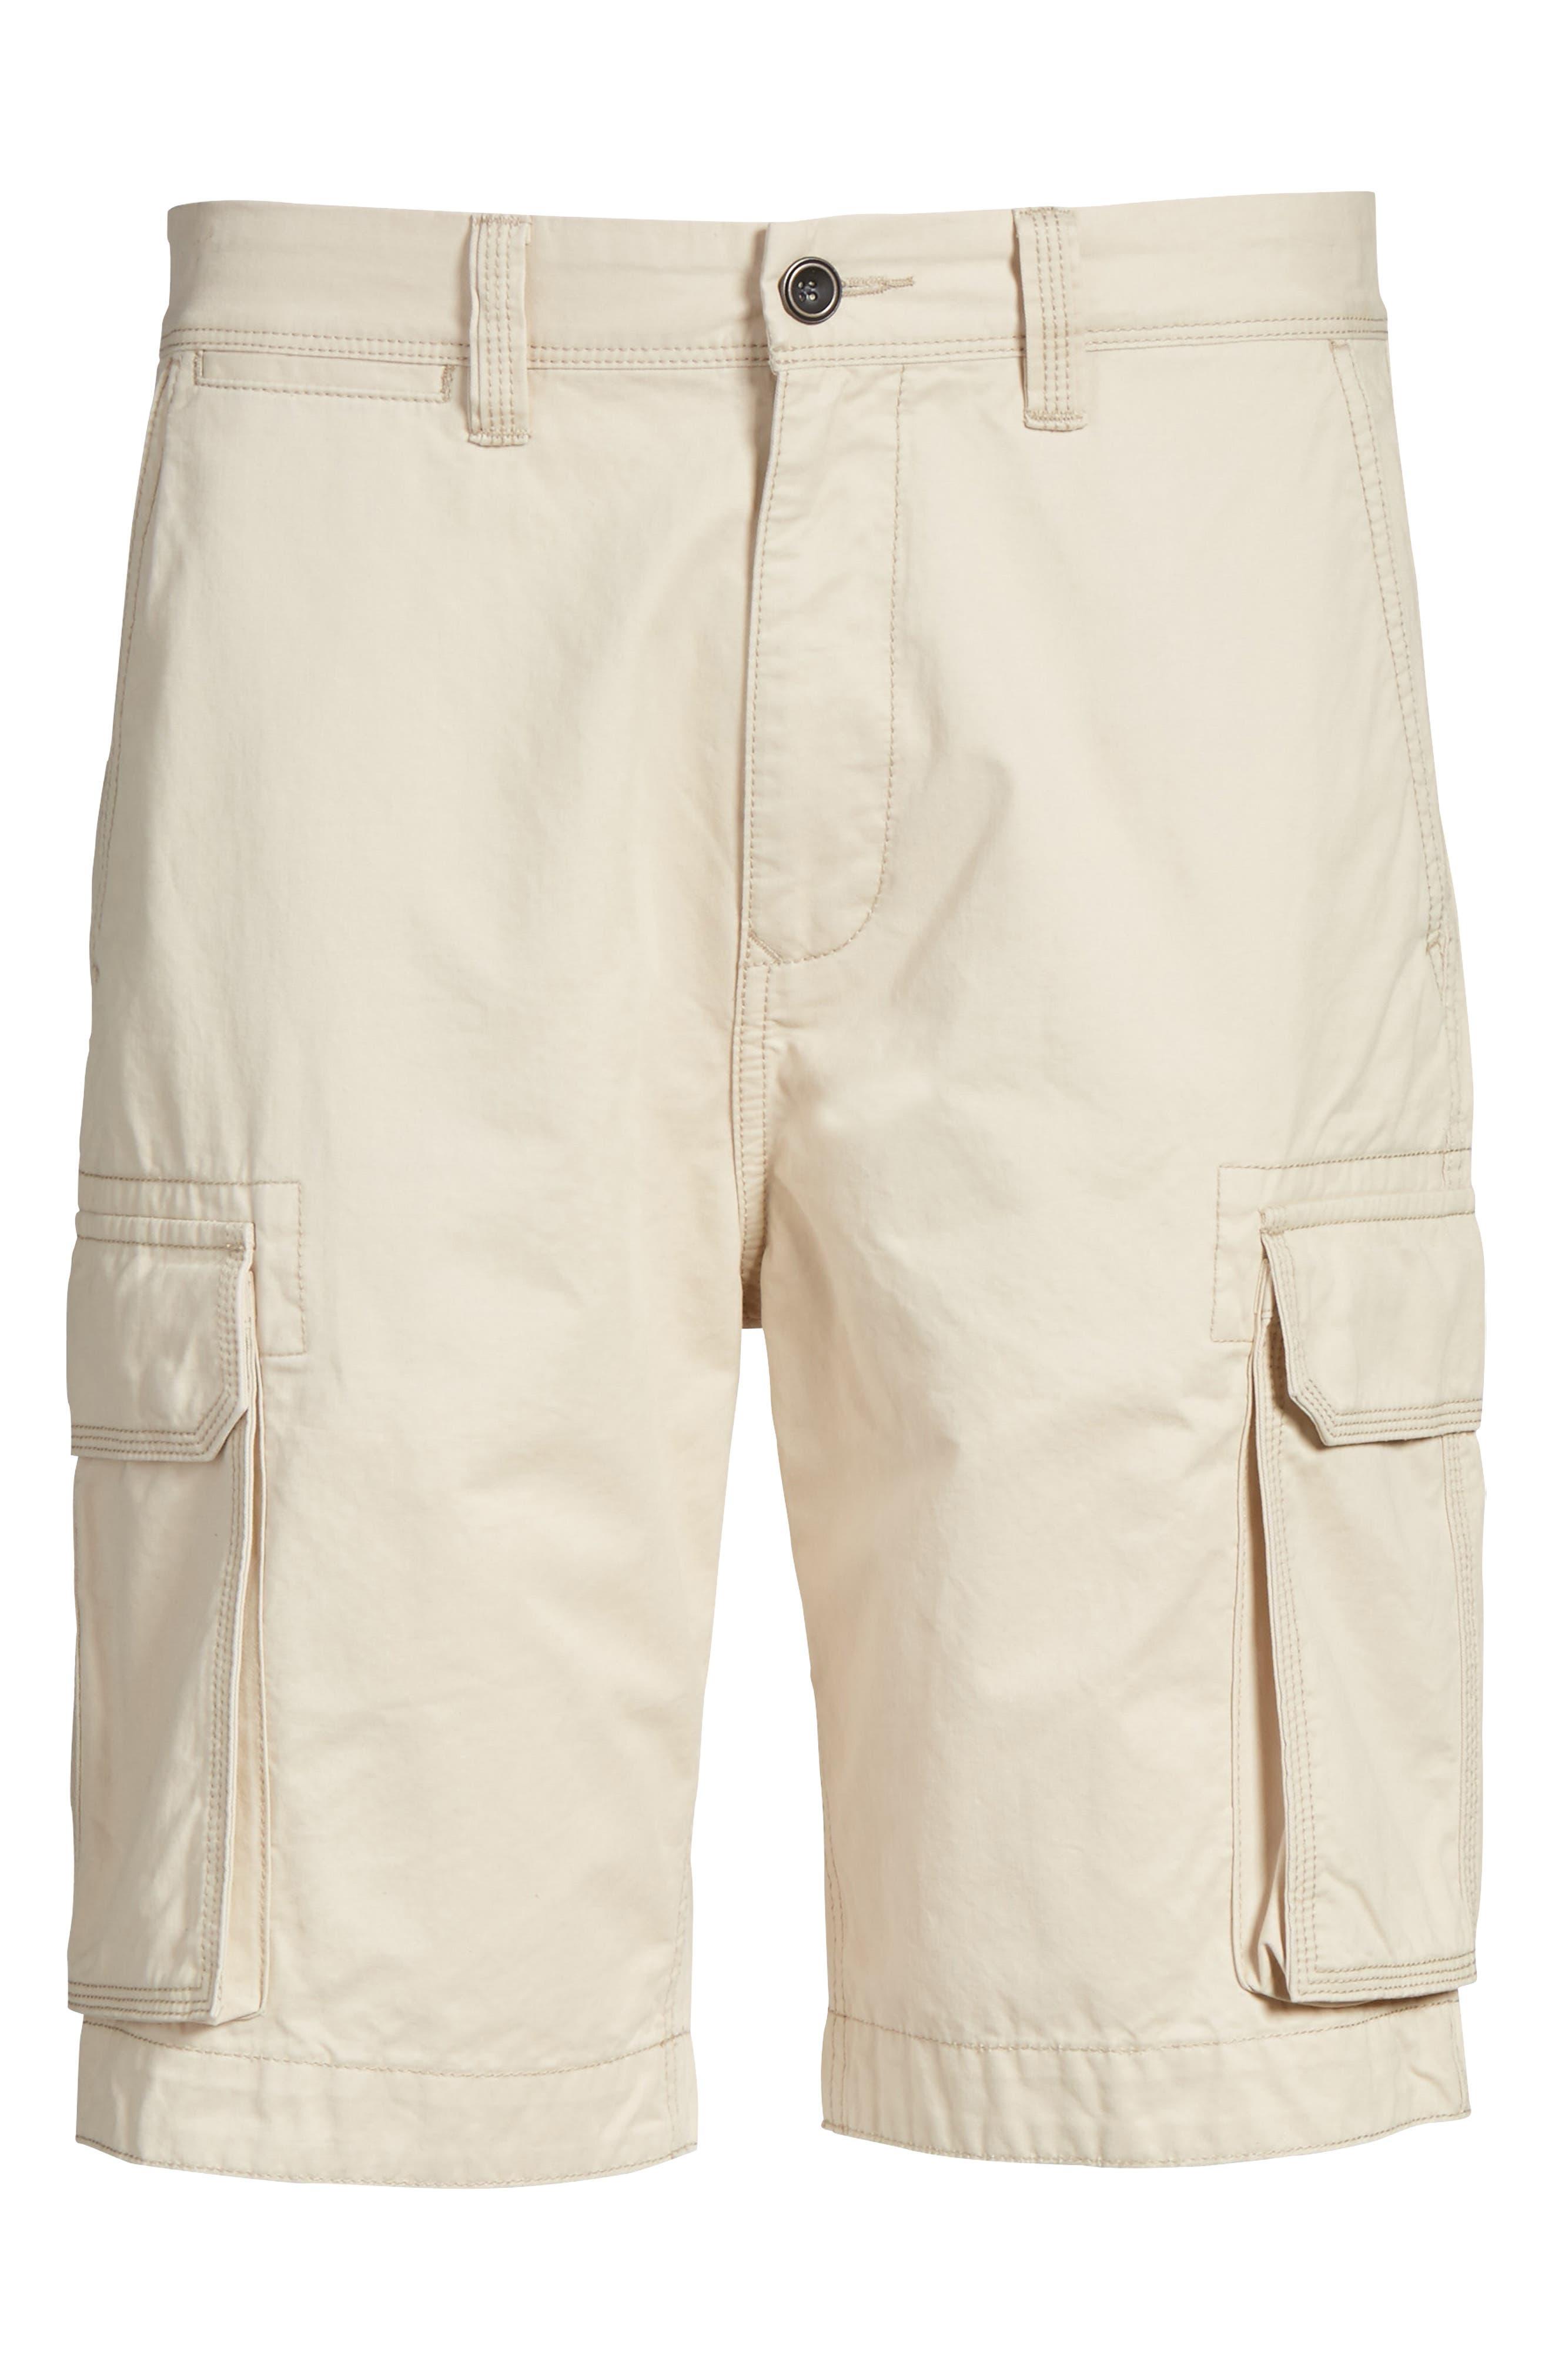 Homewood Utility Shorts,                             Alternate thumbnail 6, color,                             252